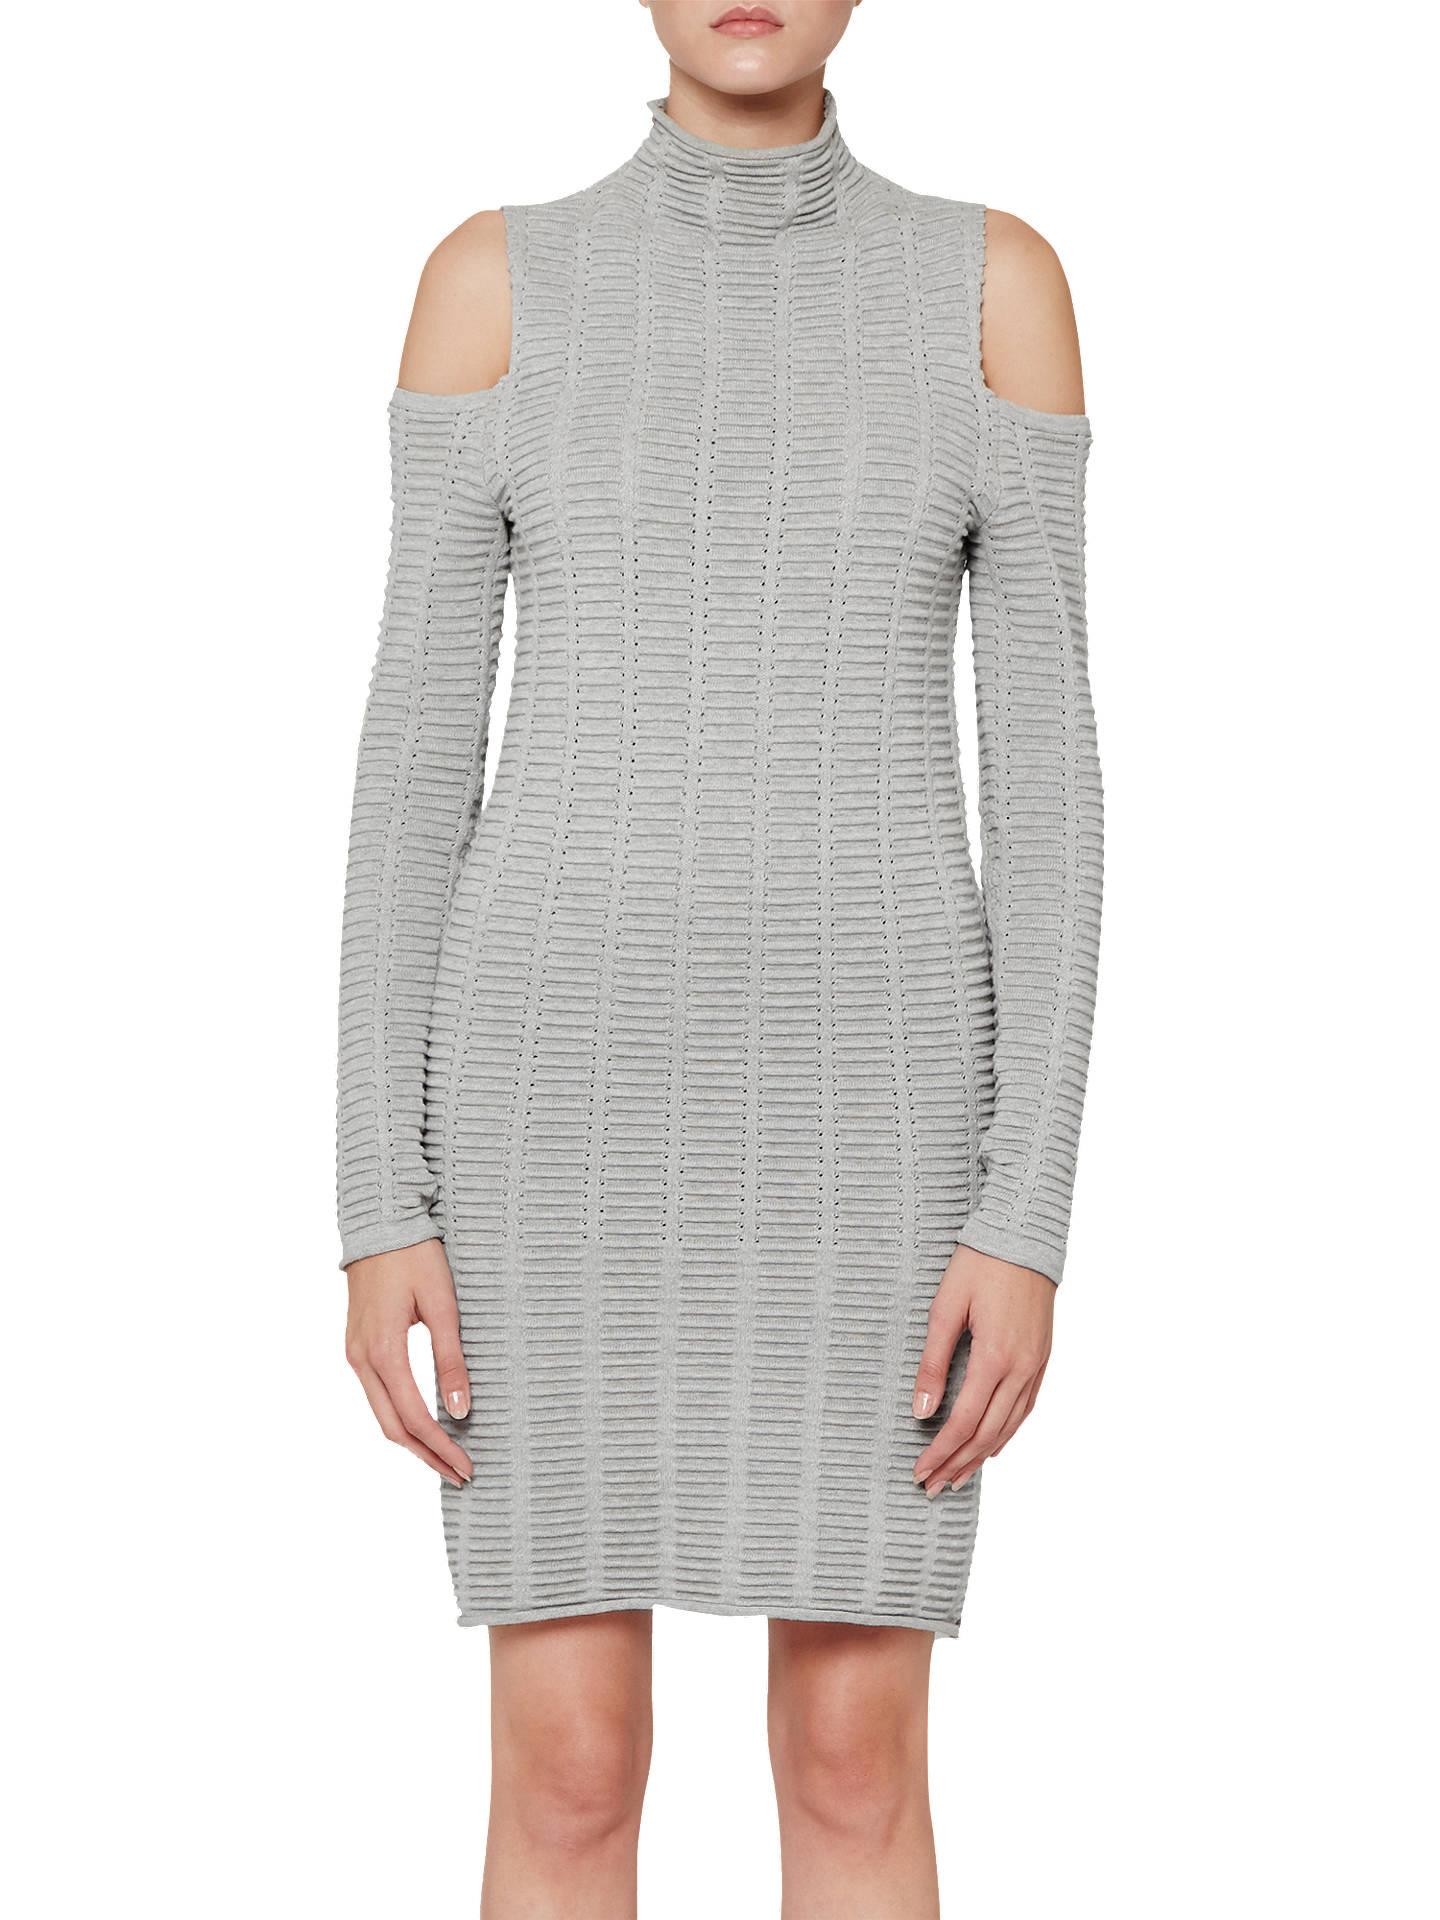 167cd968146 Buy French Connection Mozart Ladder Dress, Light Grey, 6 Online at  johnlewis.com ...